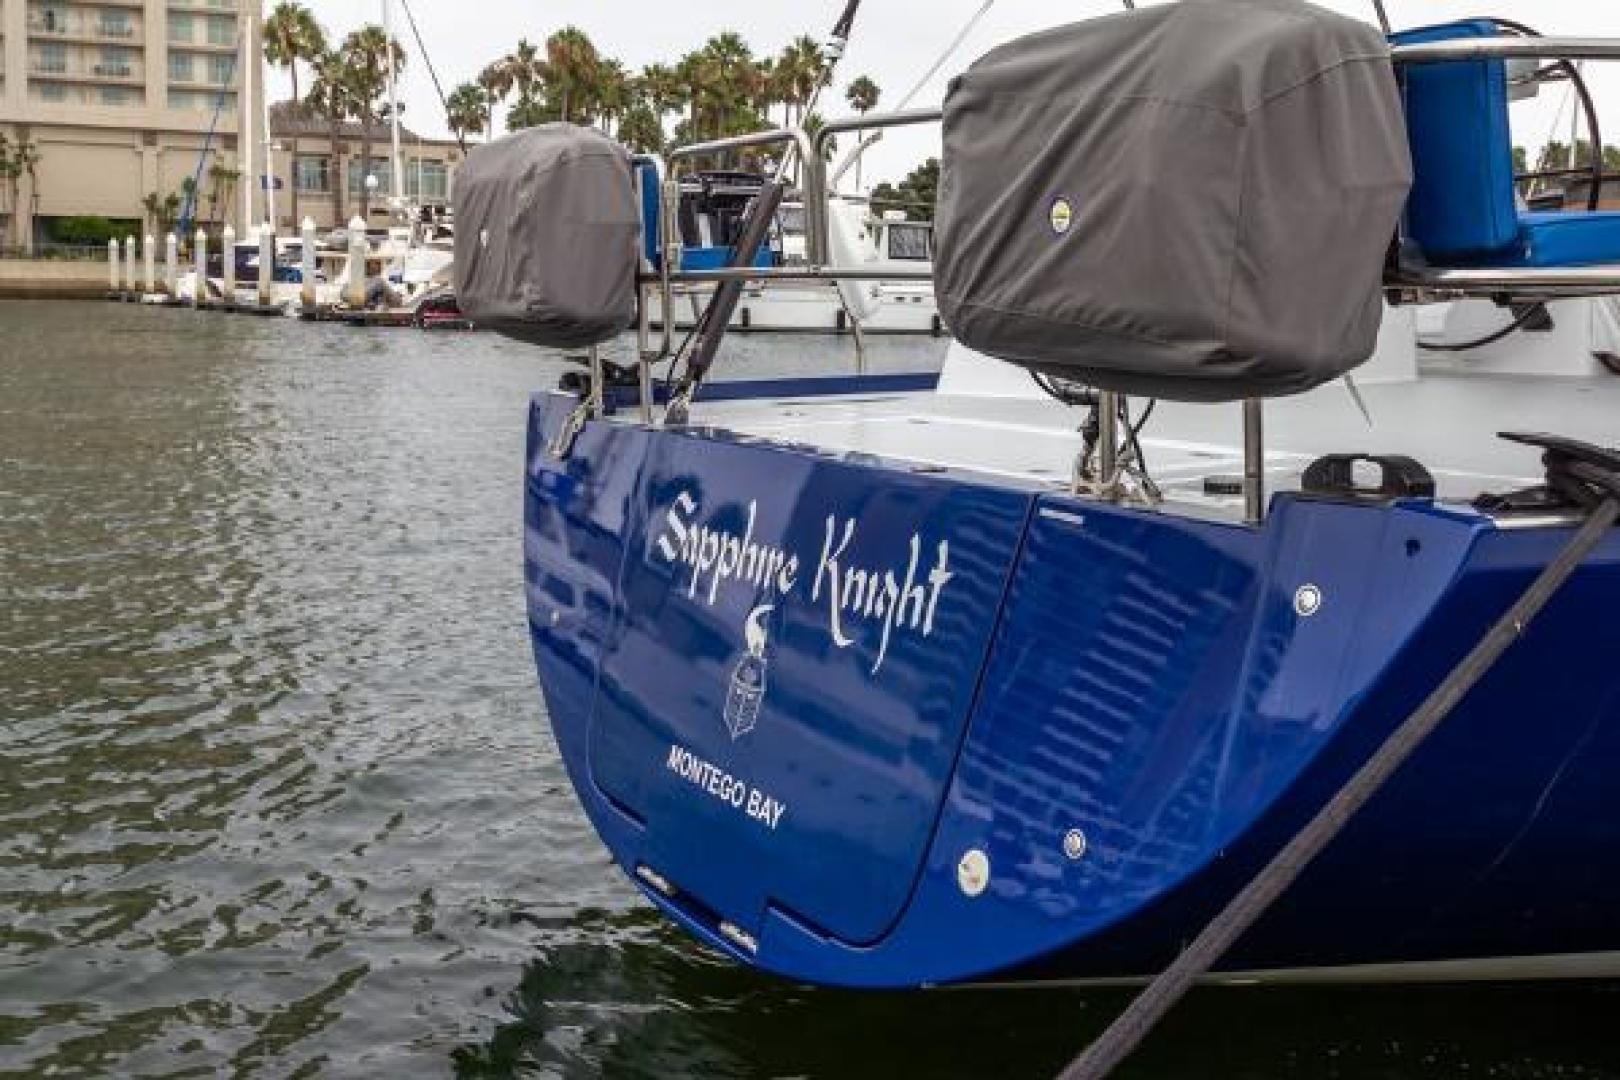 Custom-Farr 85 Deck Salon 2020-Sapphire Knight California-United States-1230222 | Thumbnail